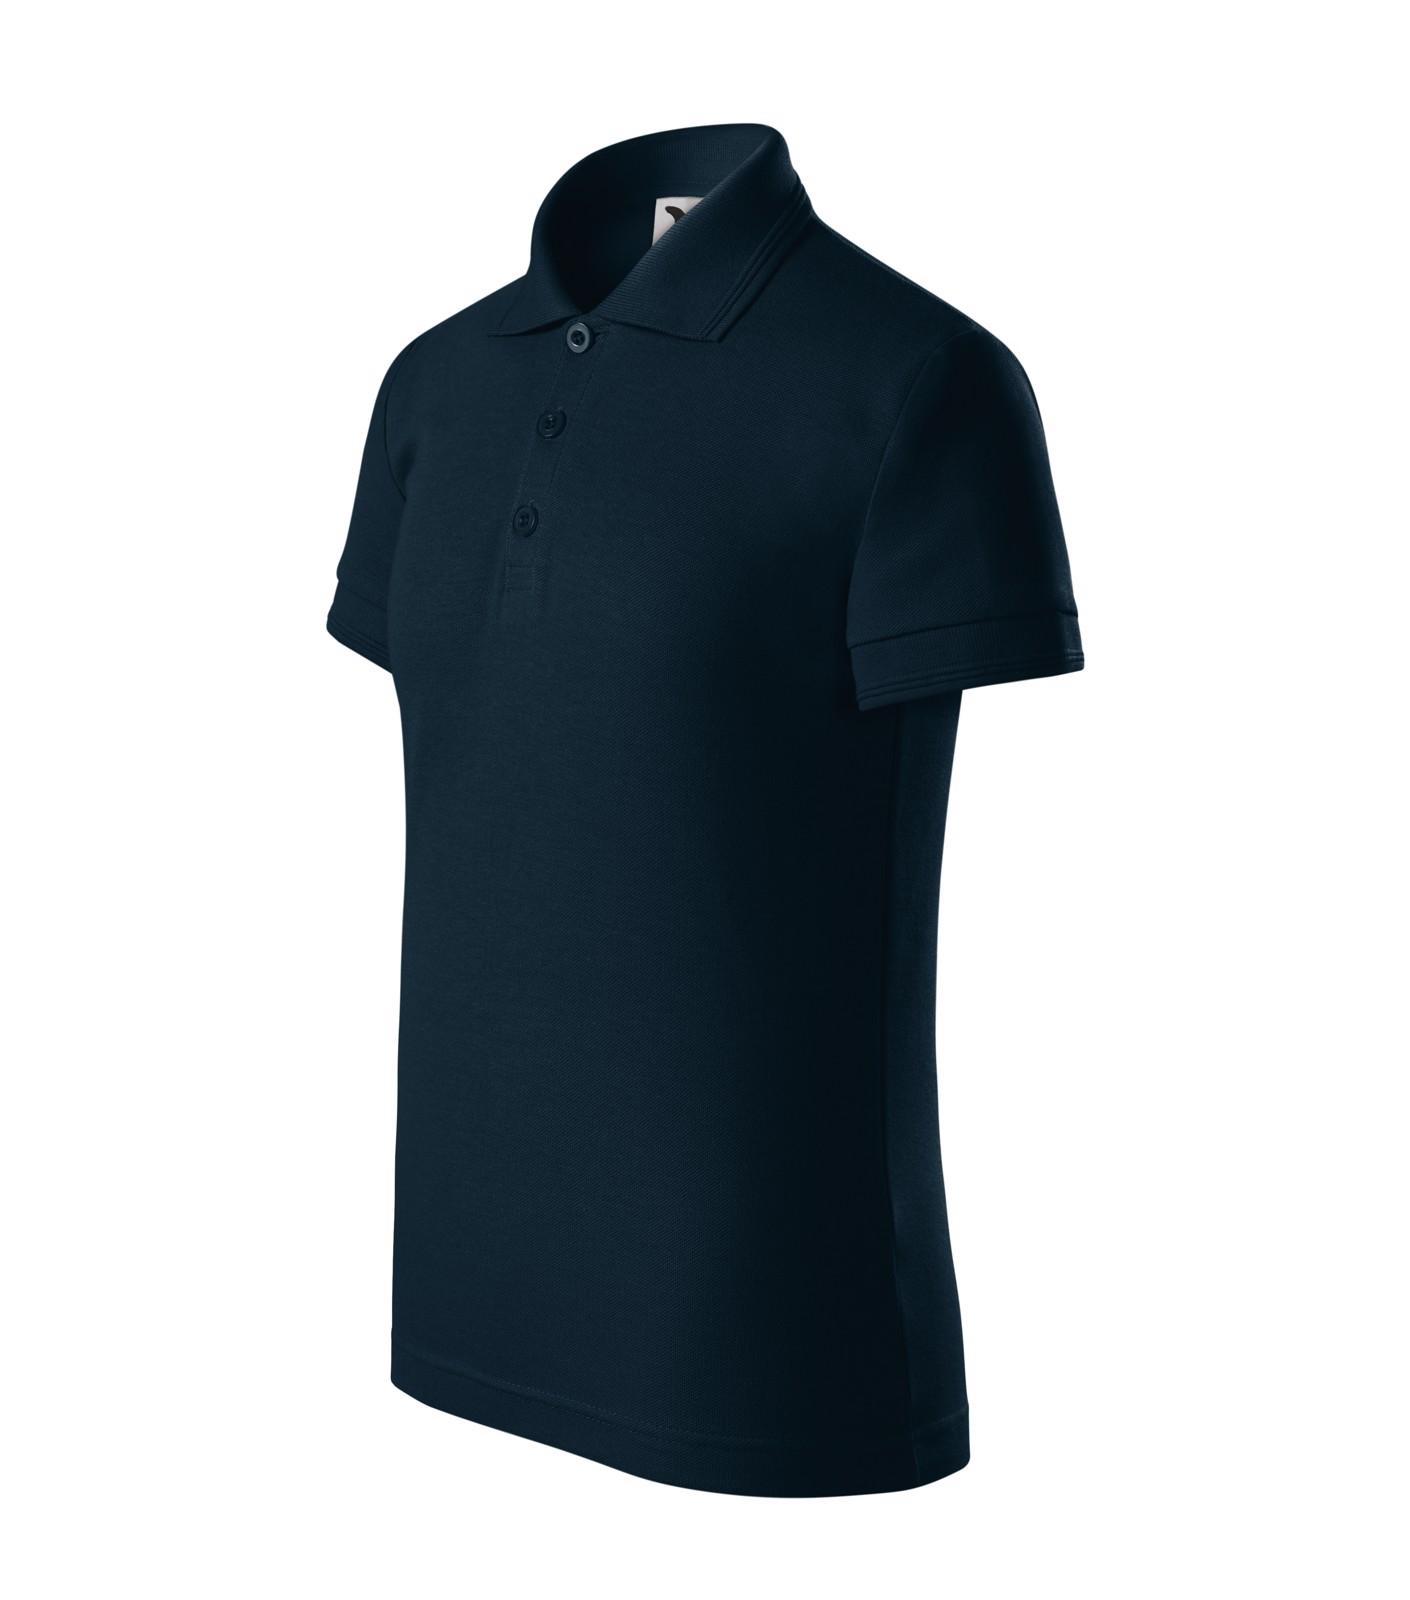 Polo Shirt Kids Malfini Pique Polo - Navy Blue / 4 years